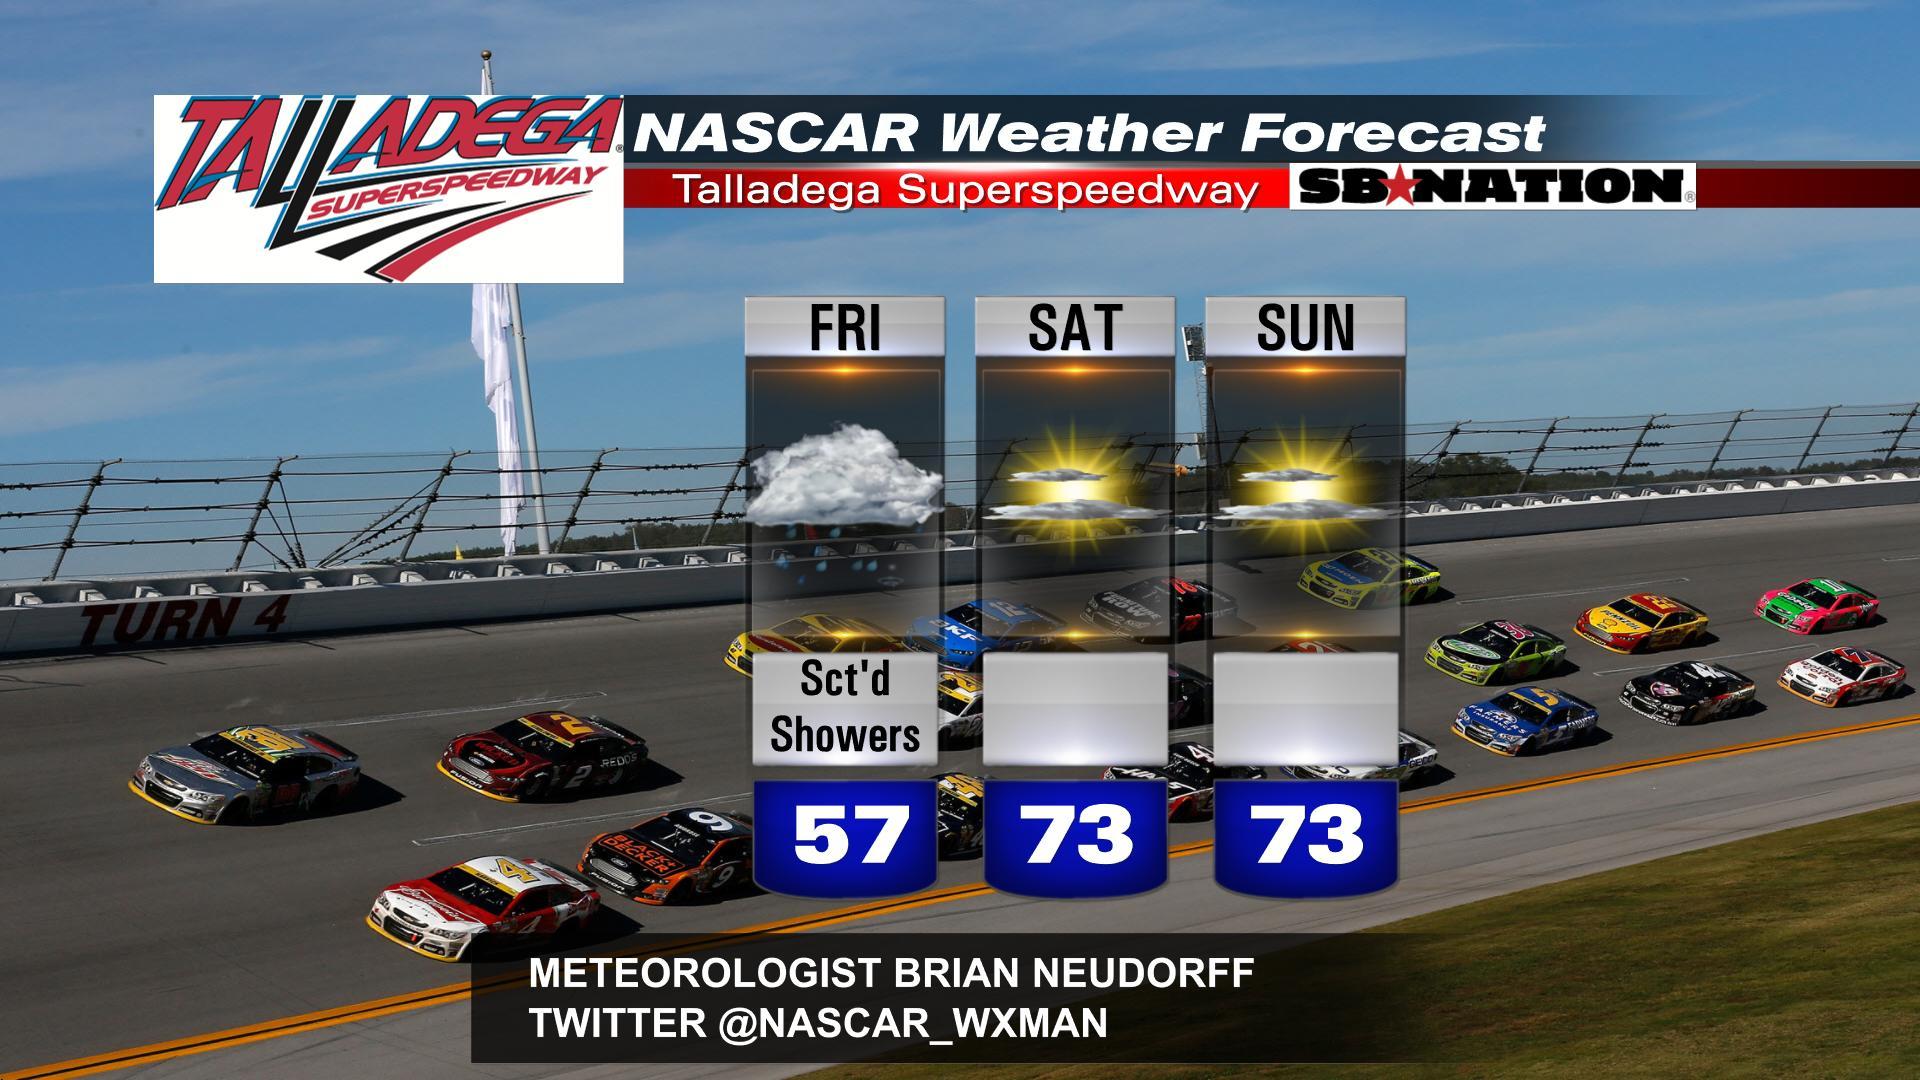 Nascar - Talladega Nascar Weather Forecast Few Friday Afternoon Showers